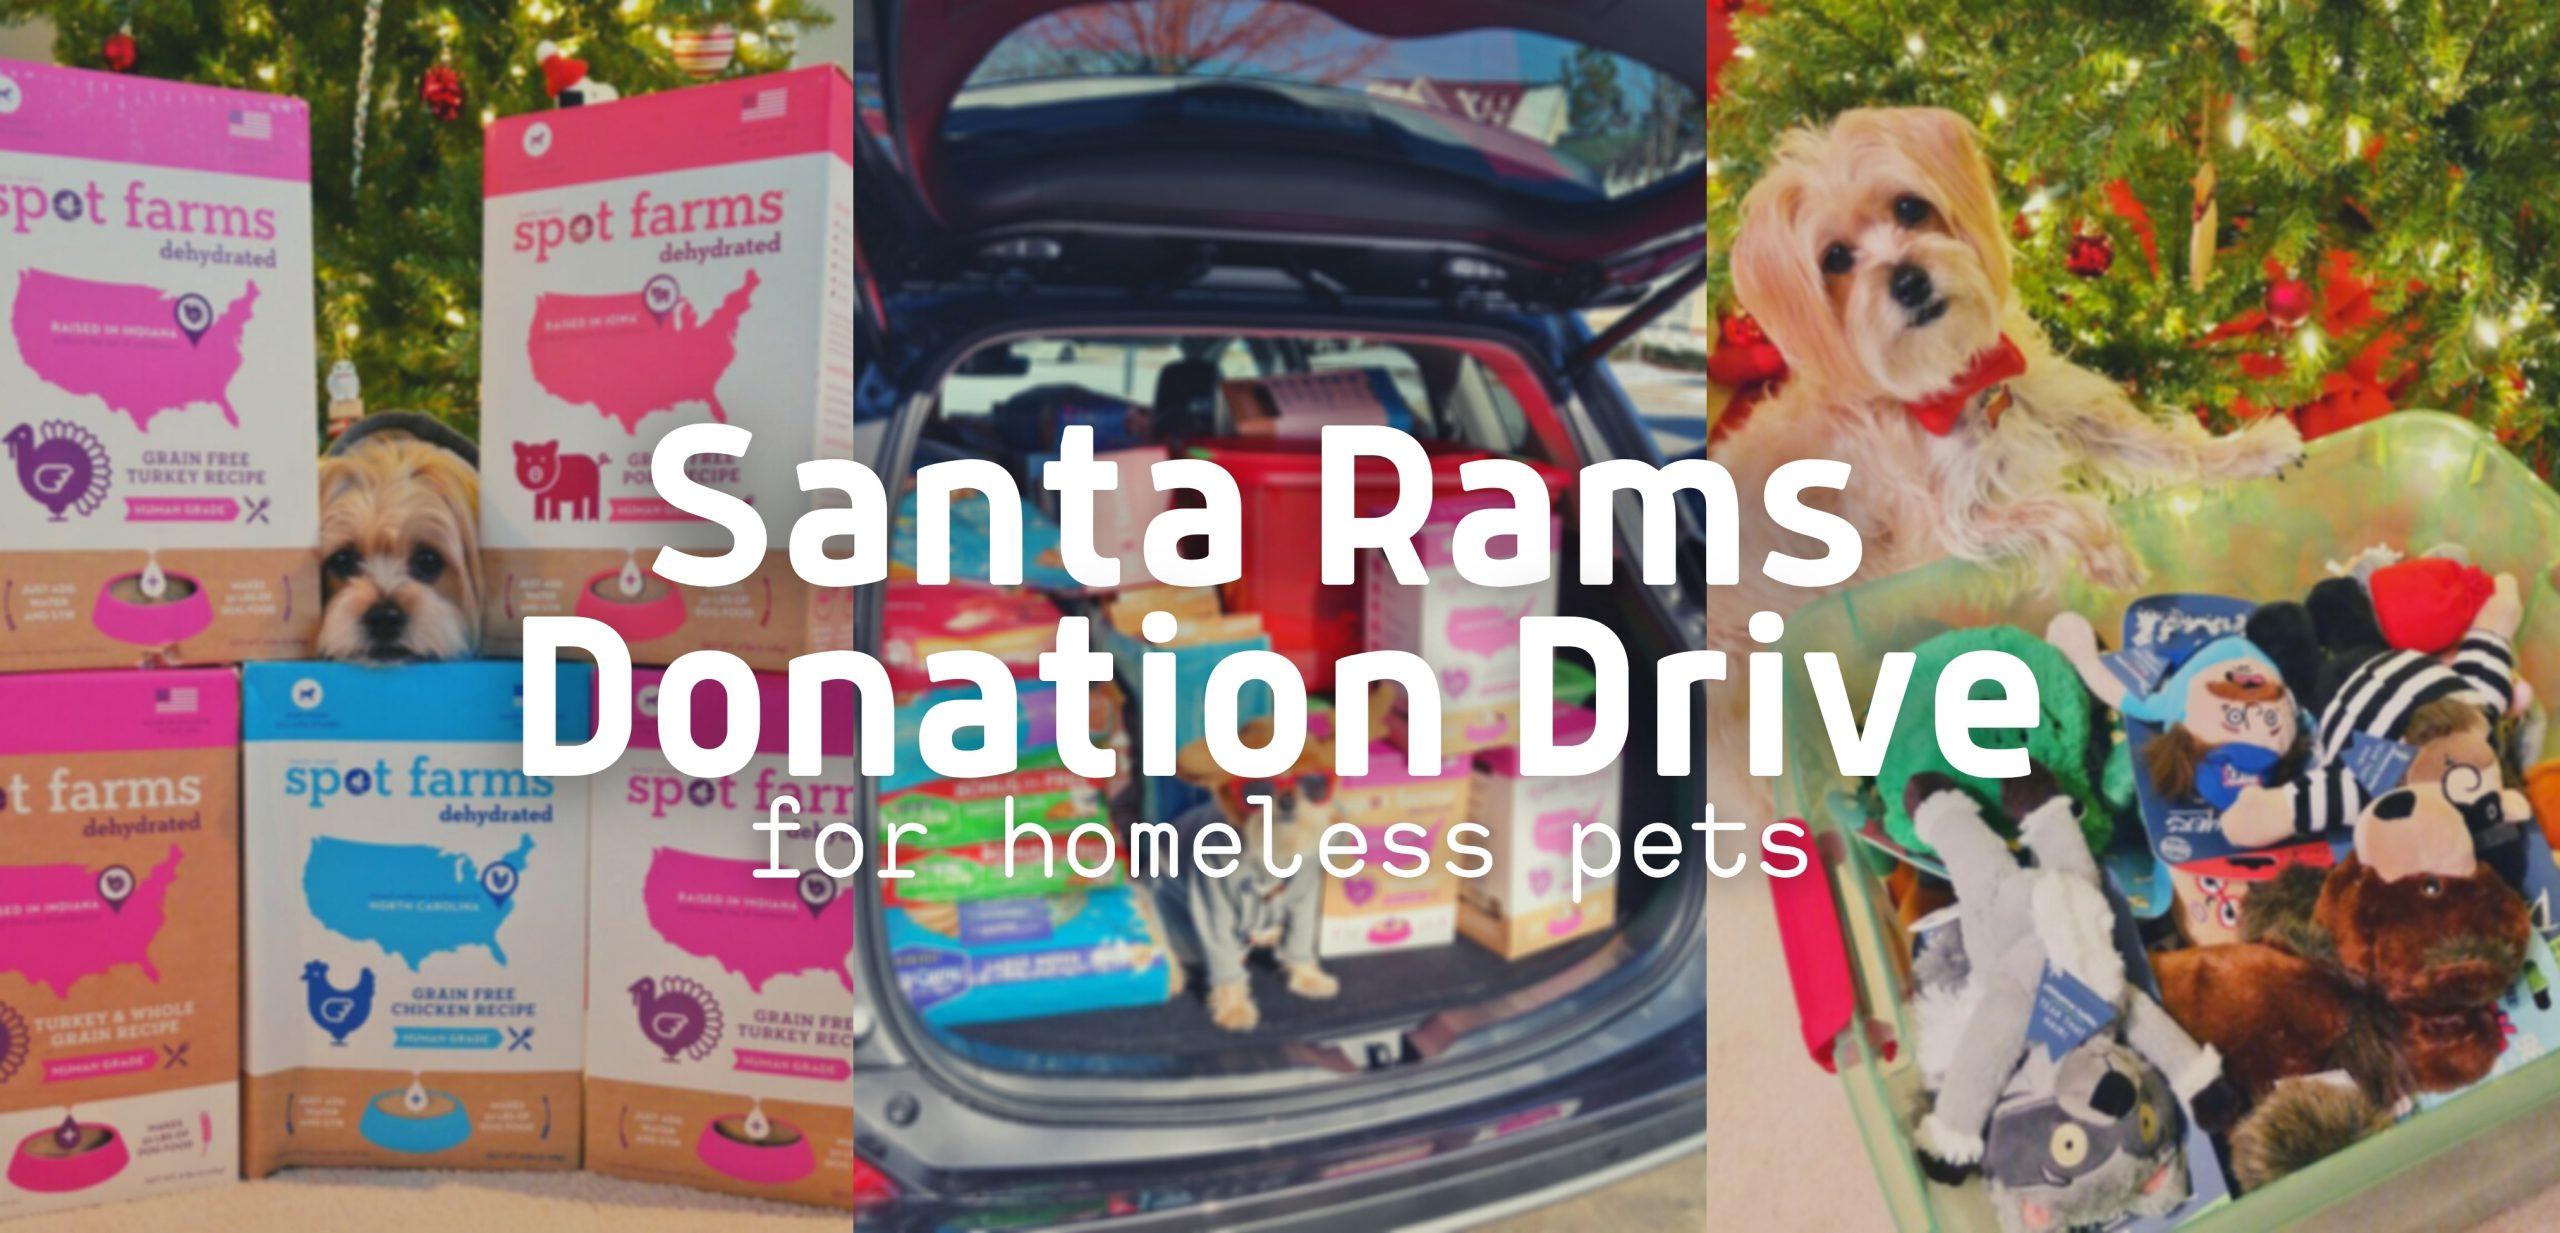 Santa Rams Donation Drive for Homeless Pets